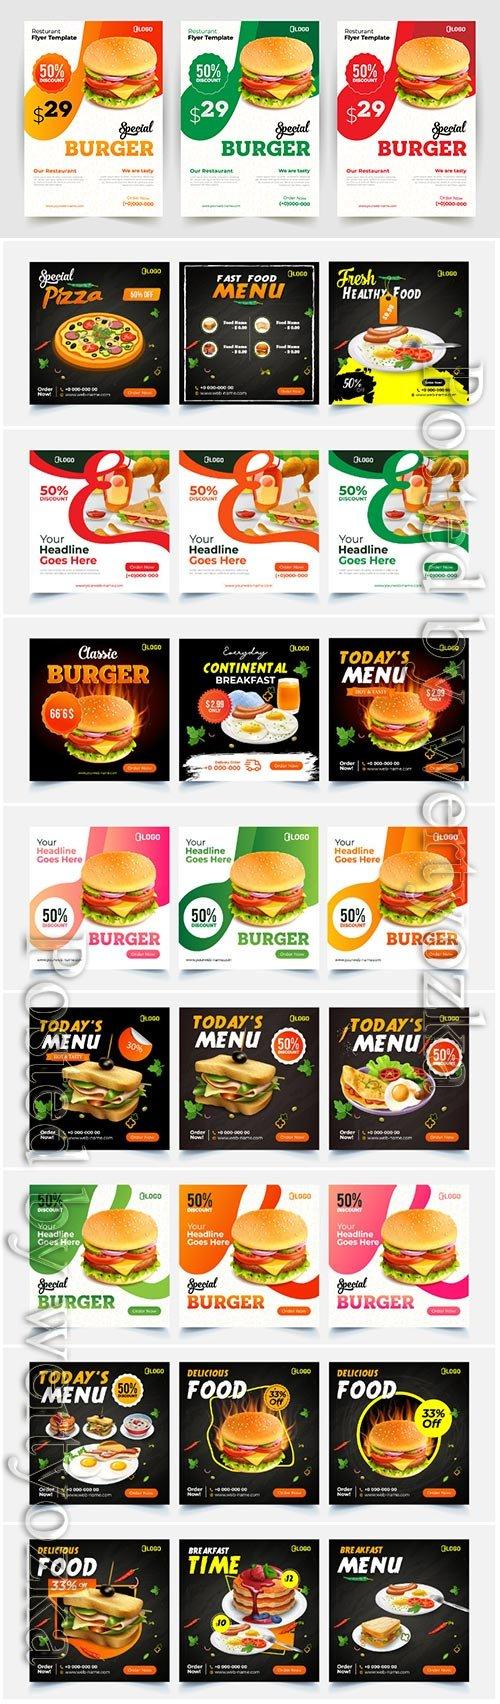 Fast food flyer, brochure design vector template